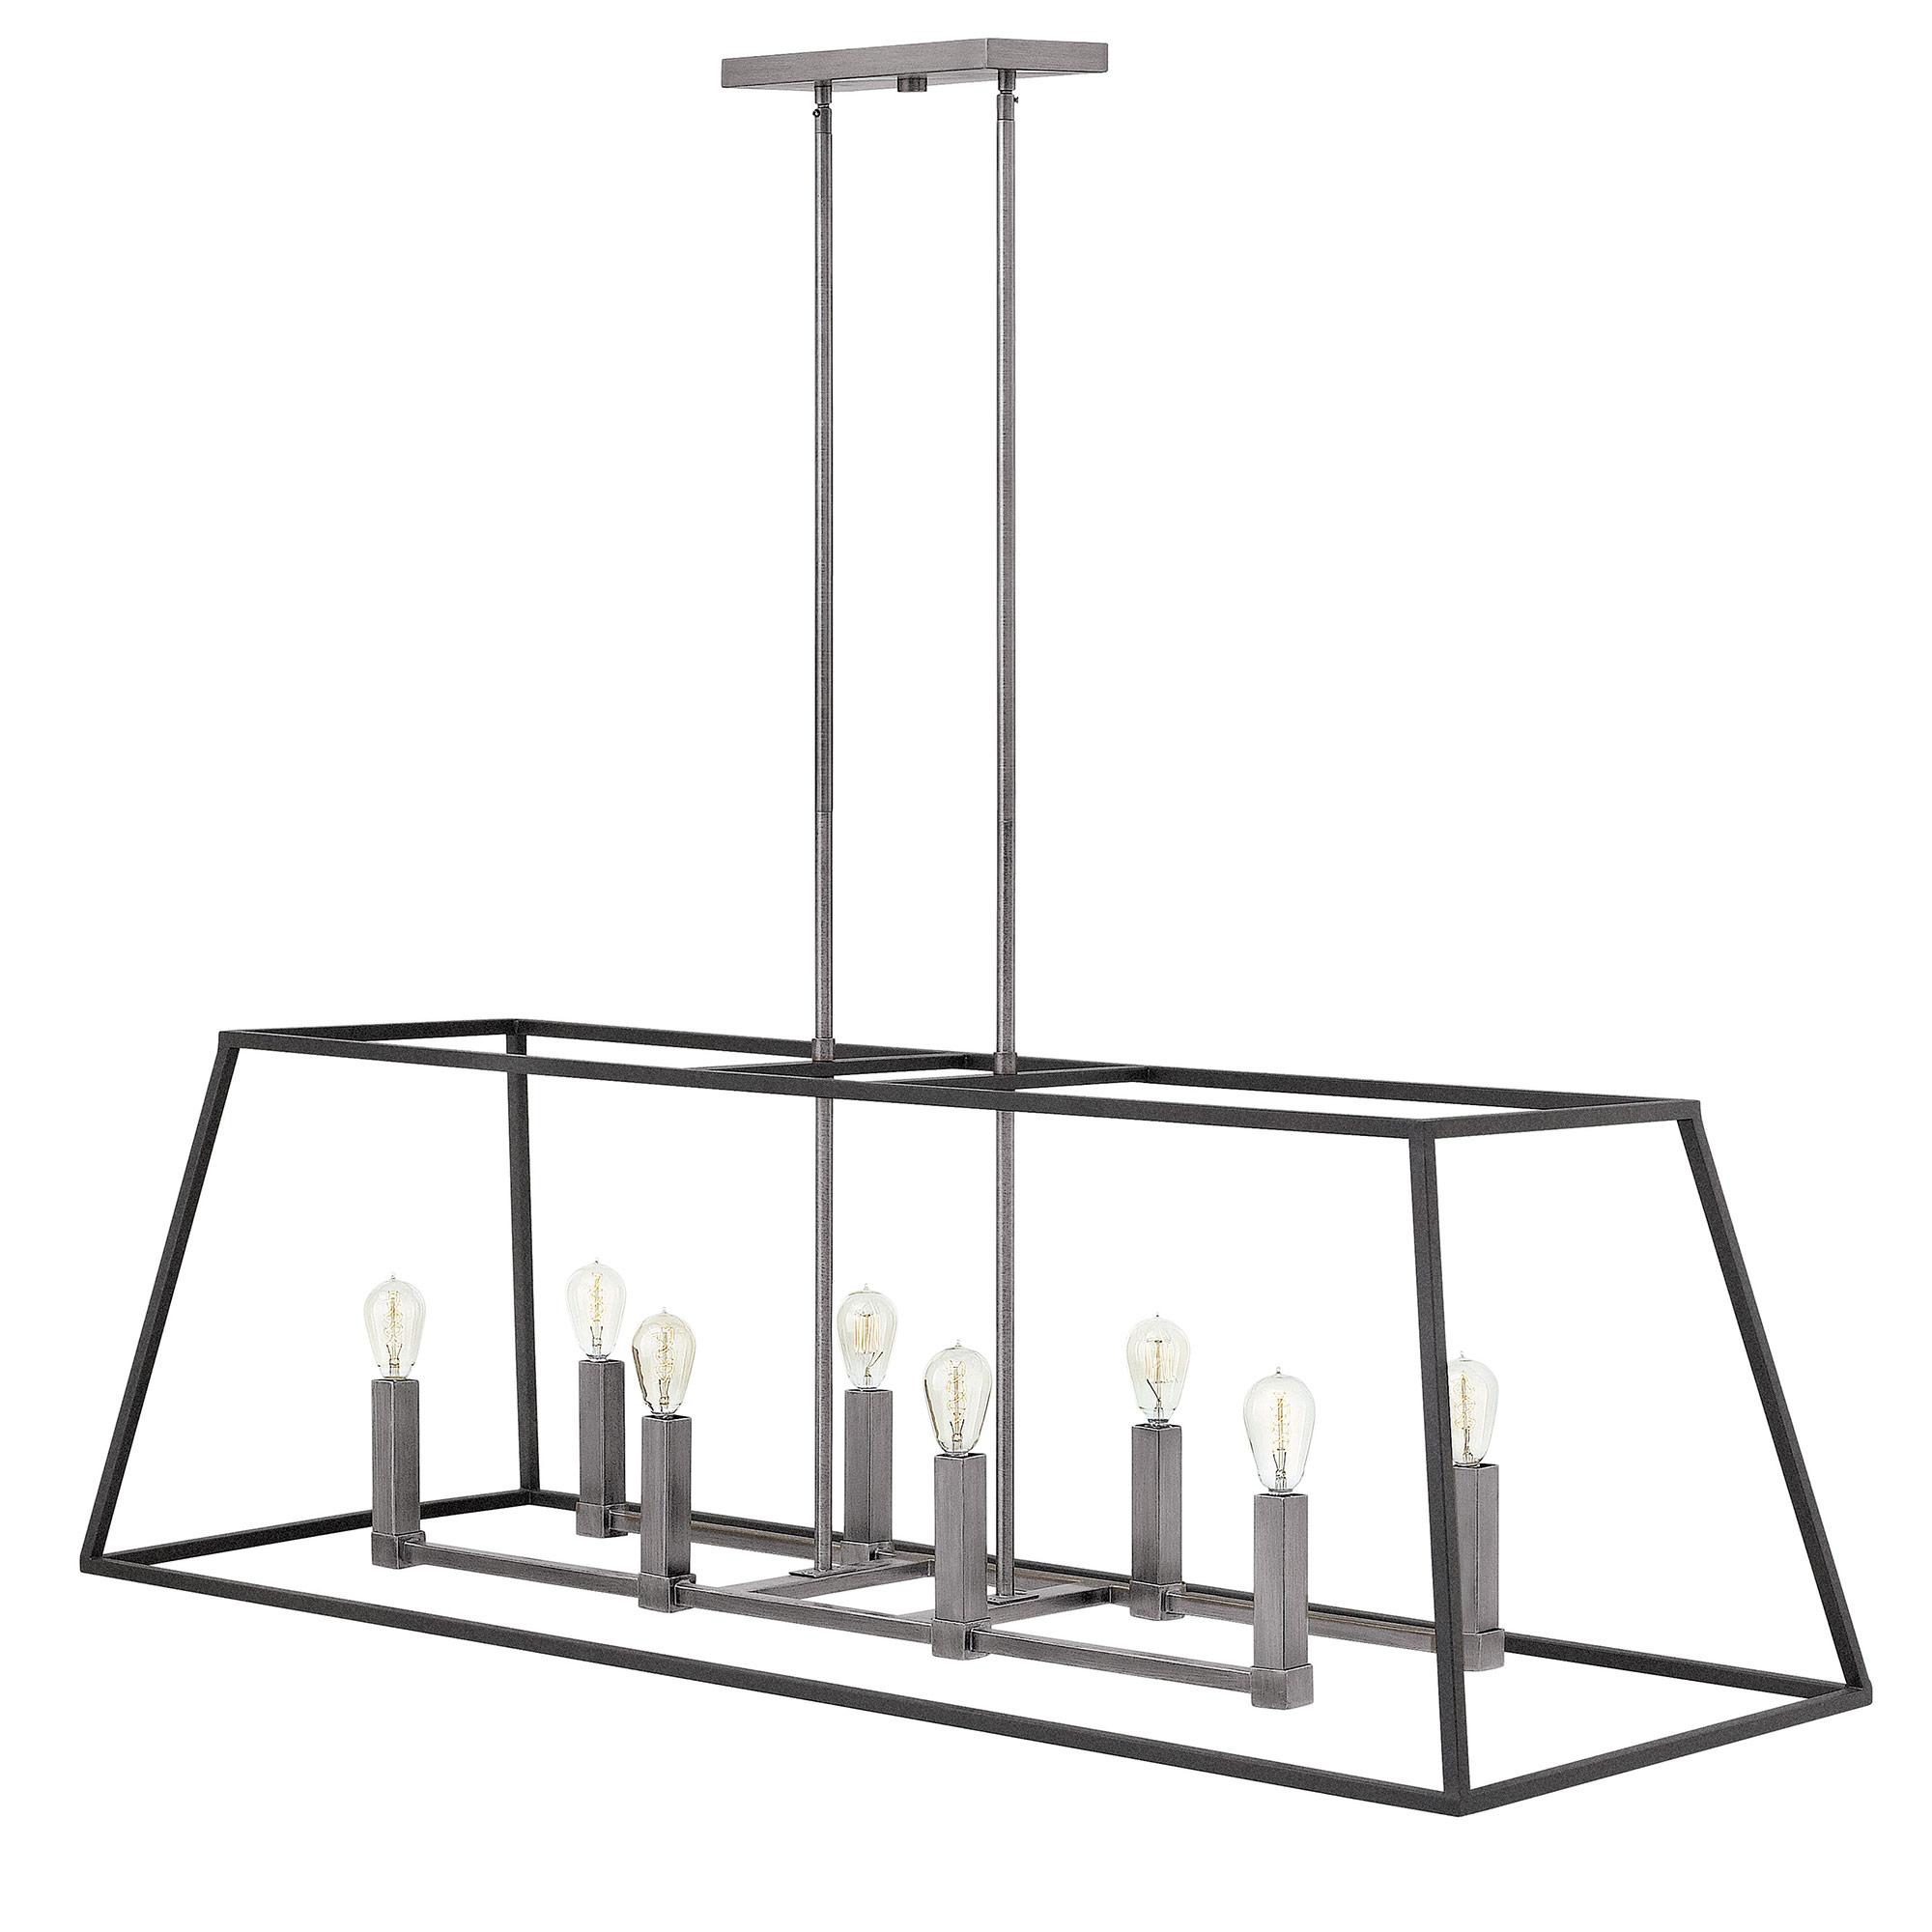 Linear Chandelier Lighting Chandeliers Design – Linear Candle Chandelier